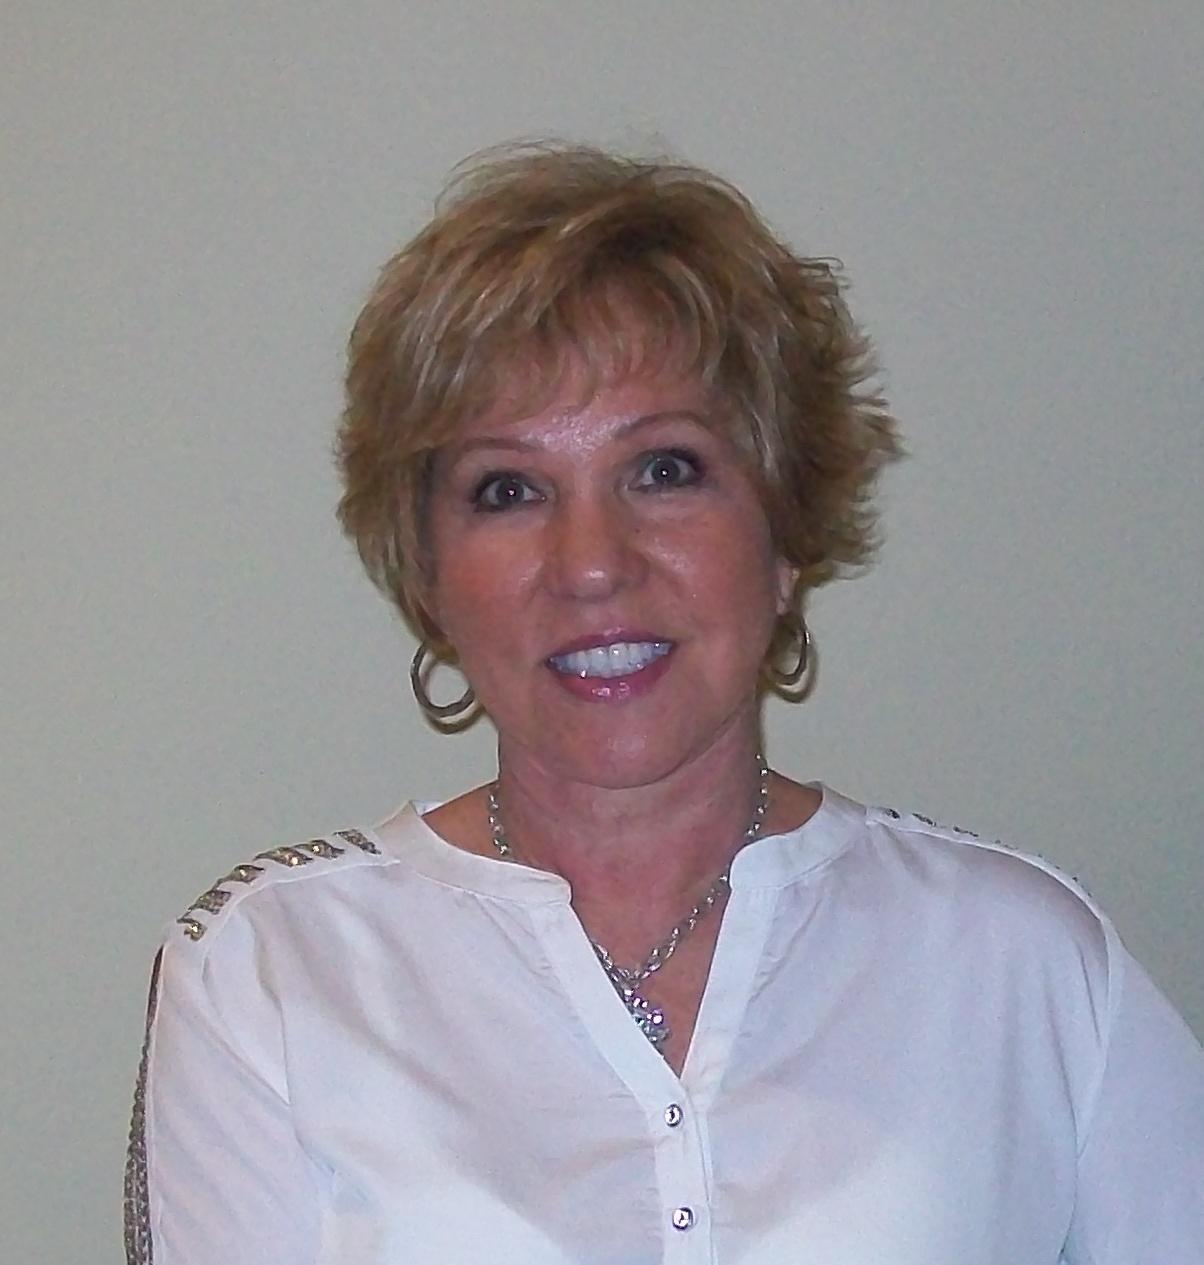 Lana Detro